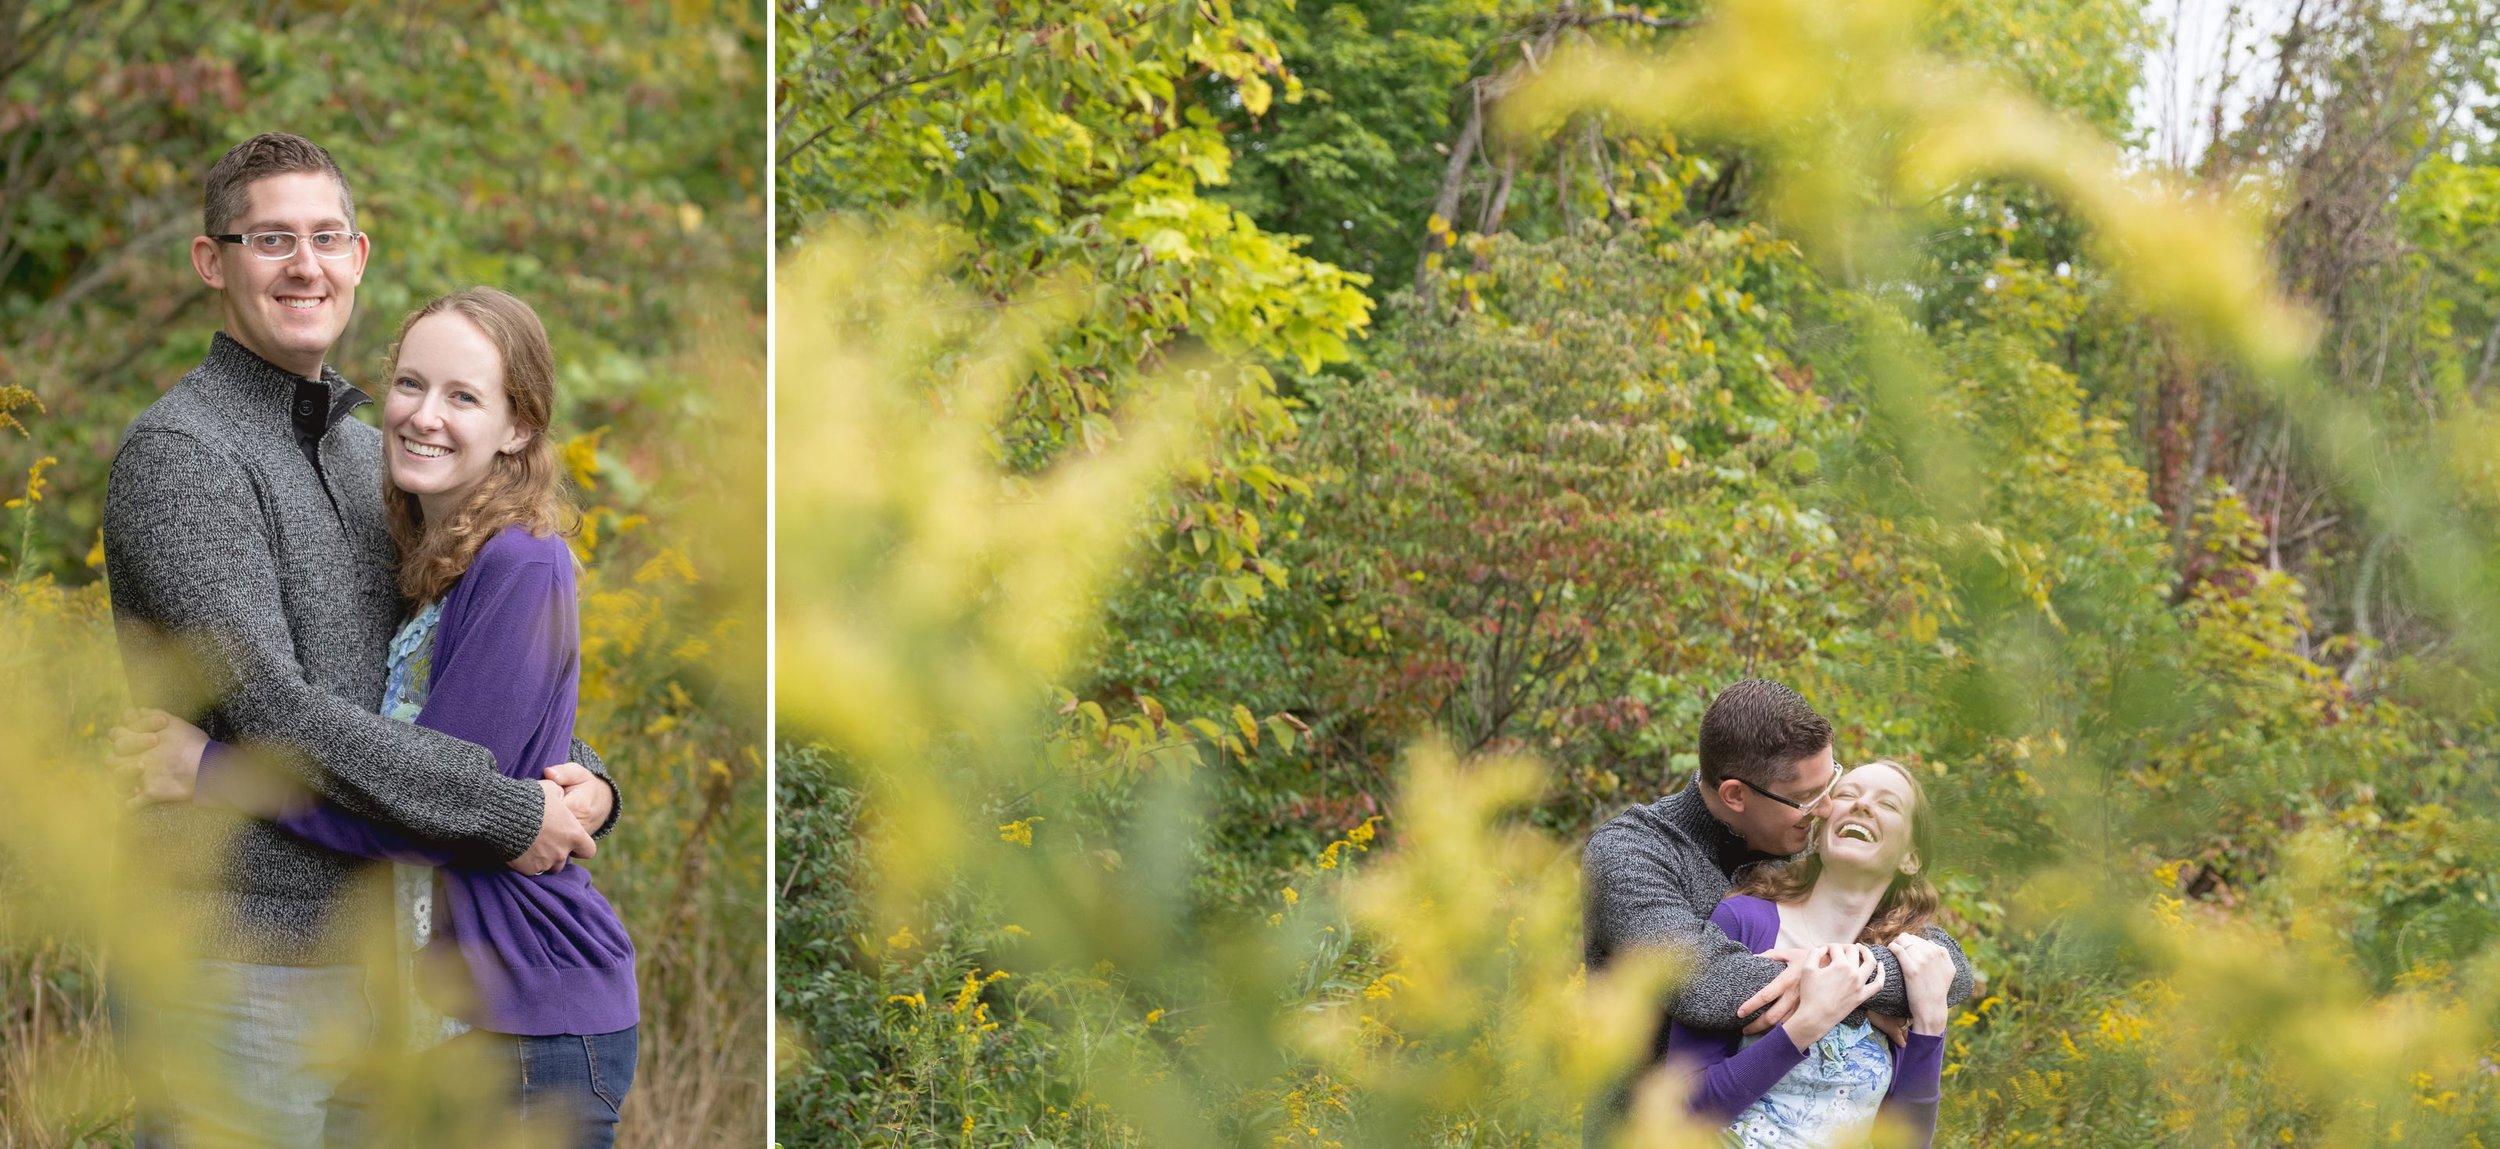 highbanks-metro-park-lewis-center-engagement-portraits-gahanna-columbus-photographer-studio-004.JPG